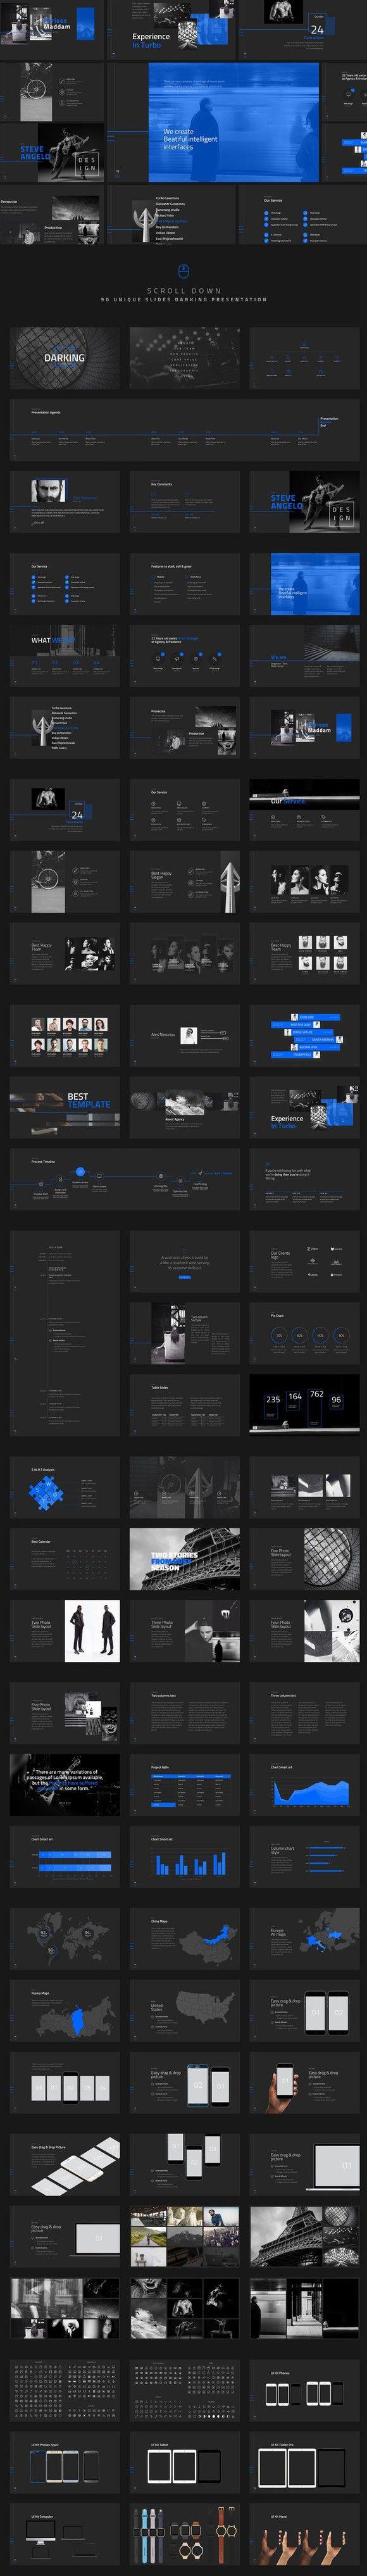 Darking-Minimal Powerpoint Template. Business Infographic